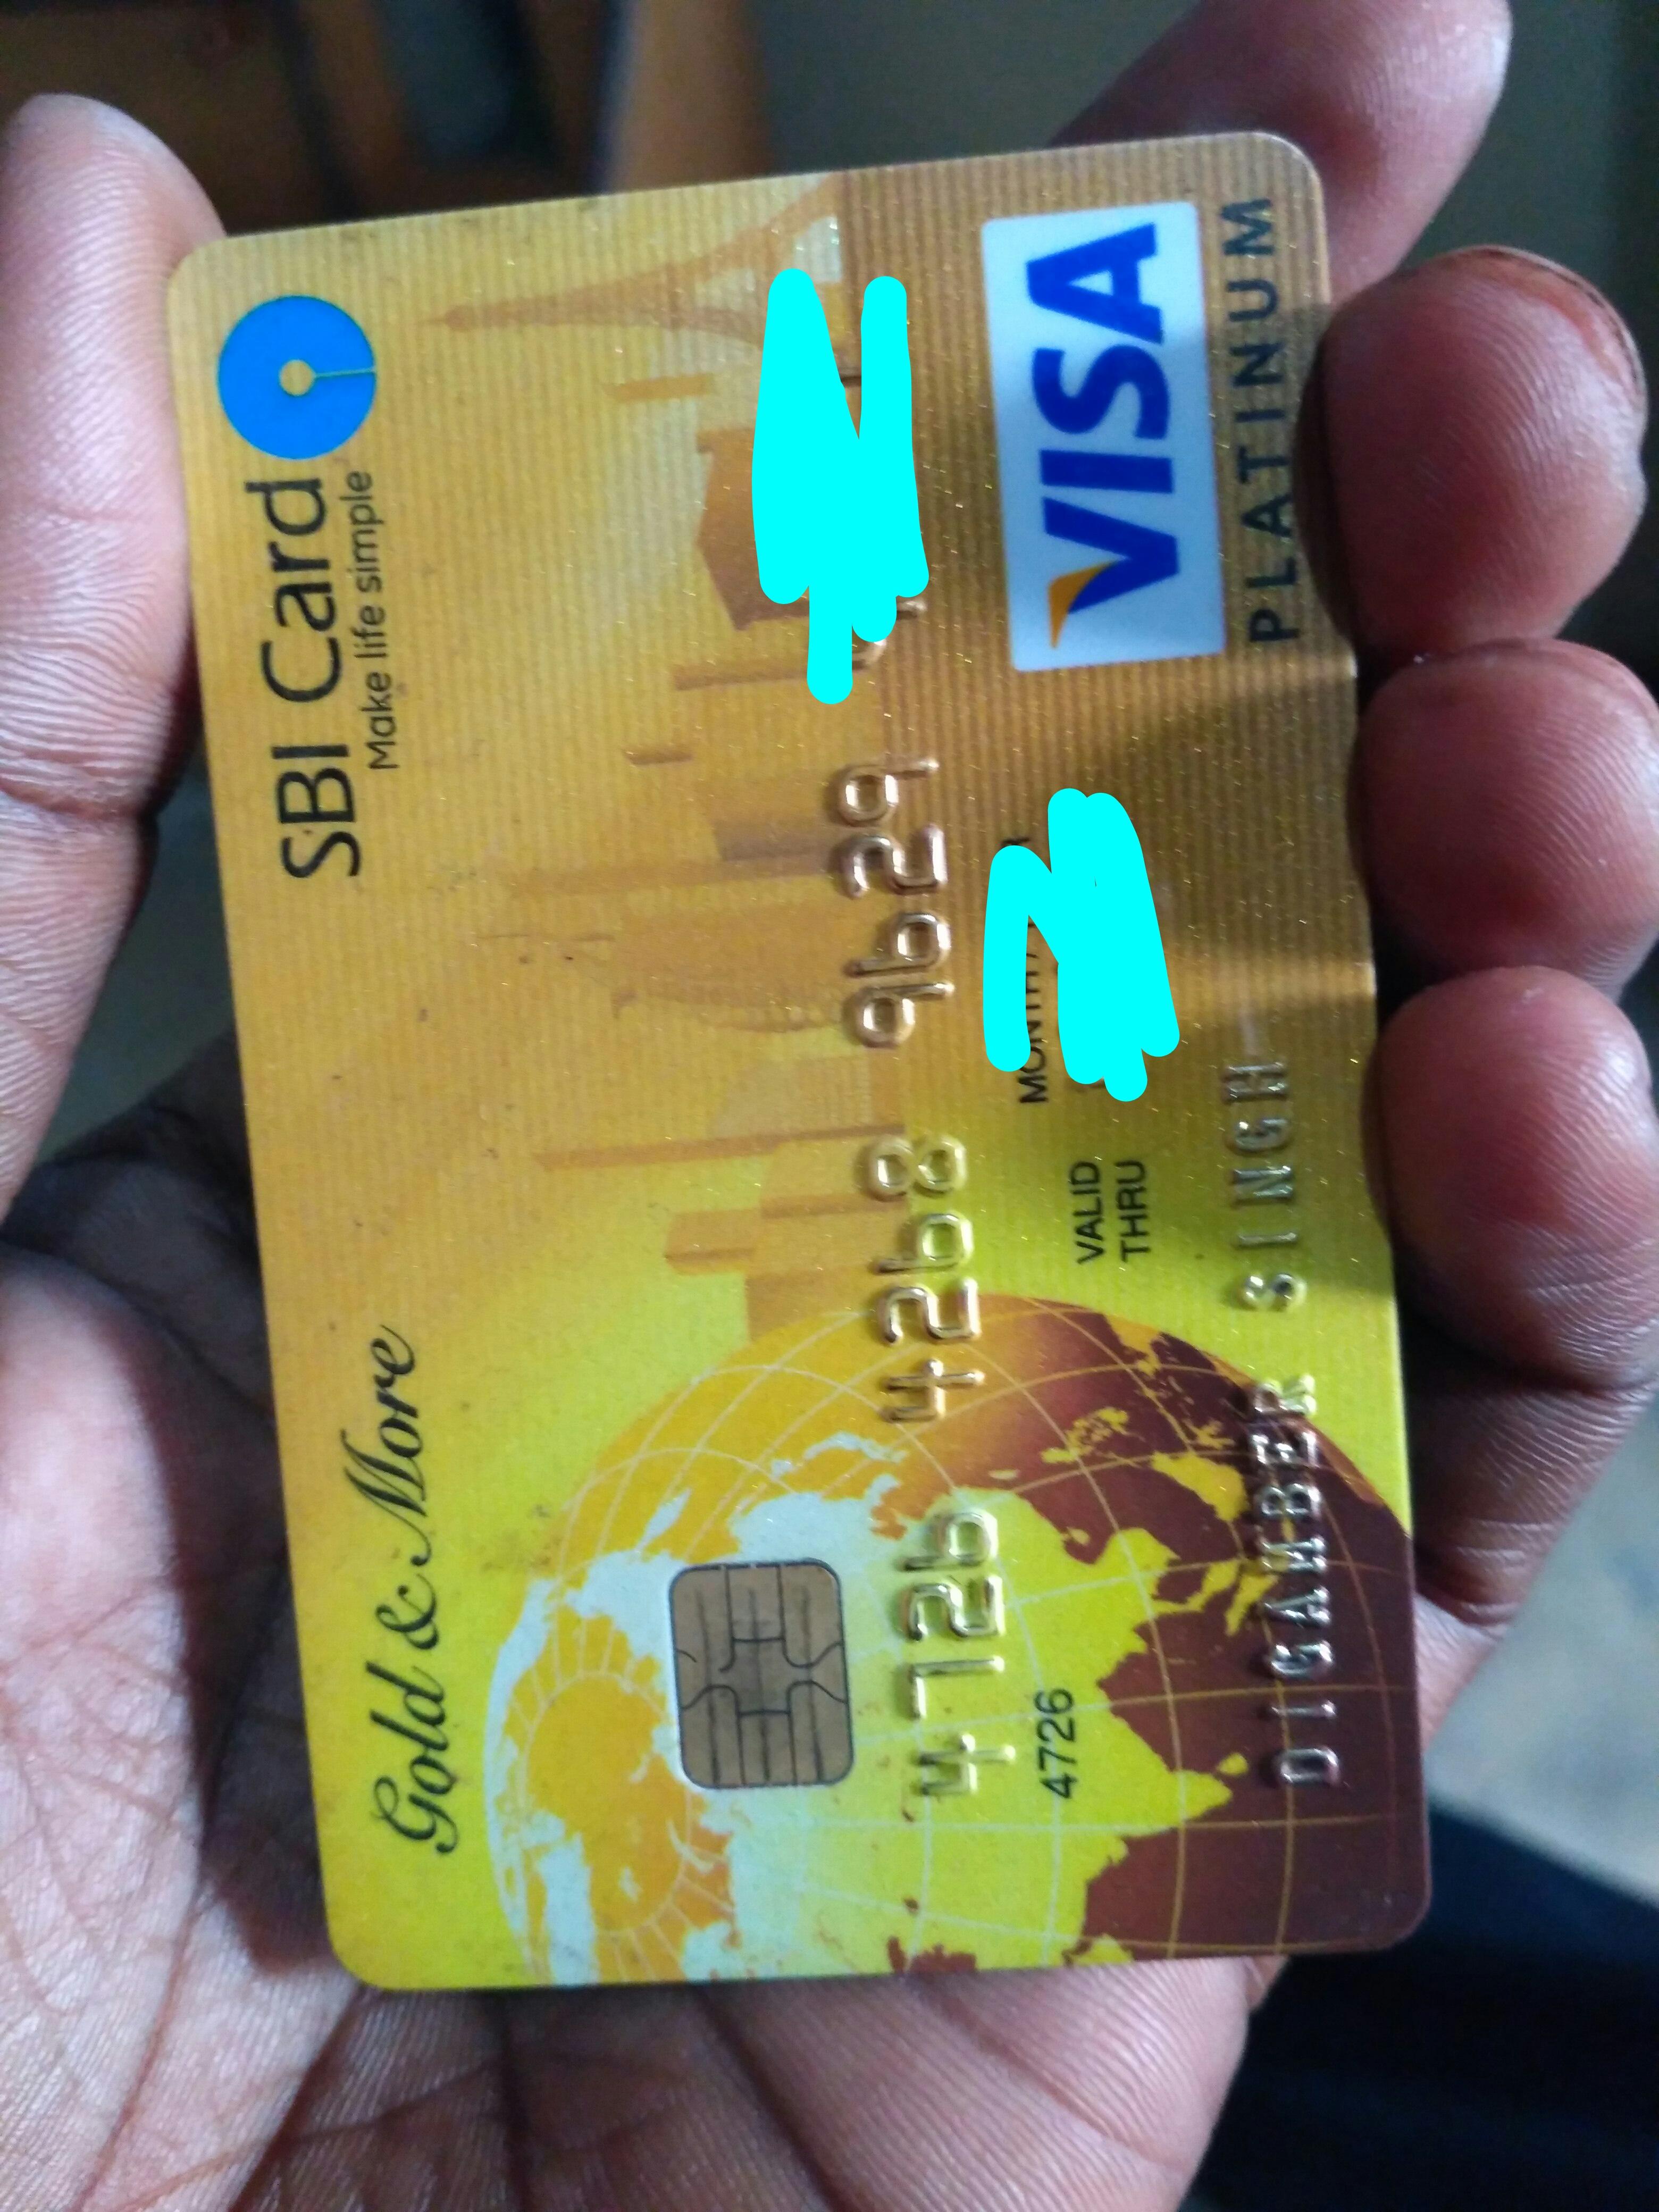 Sbi gold more credit card review